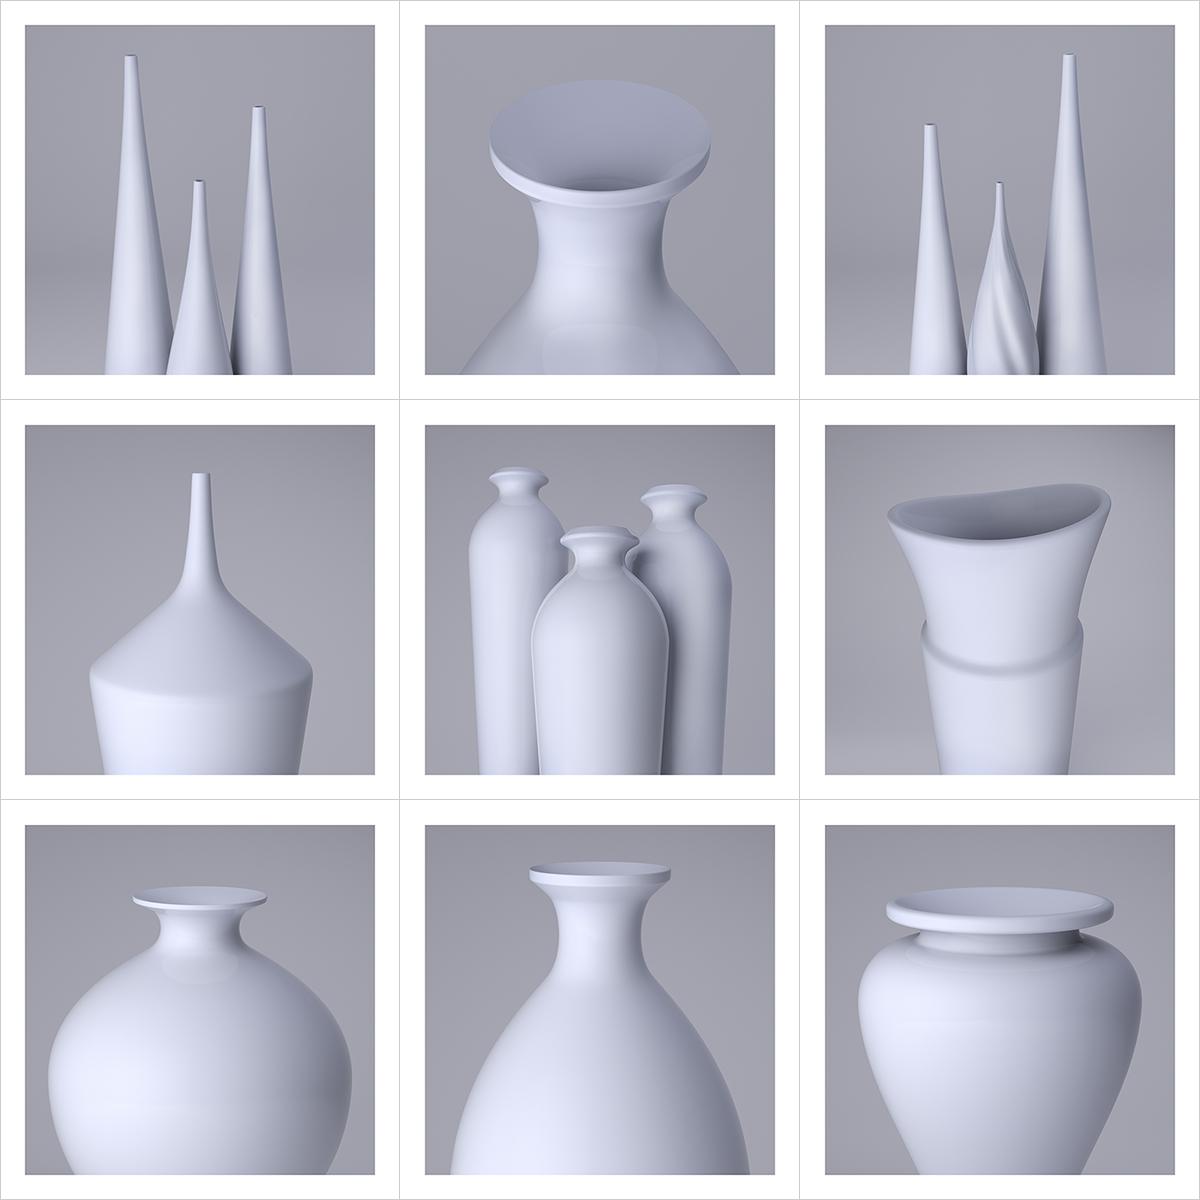 235 Lsdr TWHS Virtual Ceramics II 000 - 2021 - La simplicité du regard. This was HomoSapiens. Virtual Ceramics. II